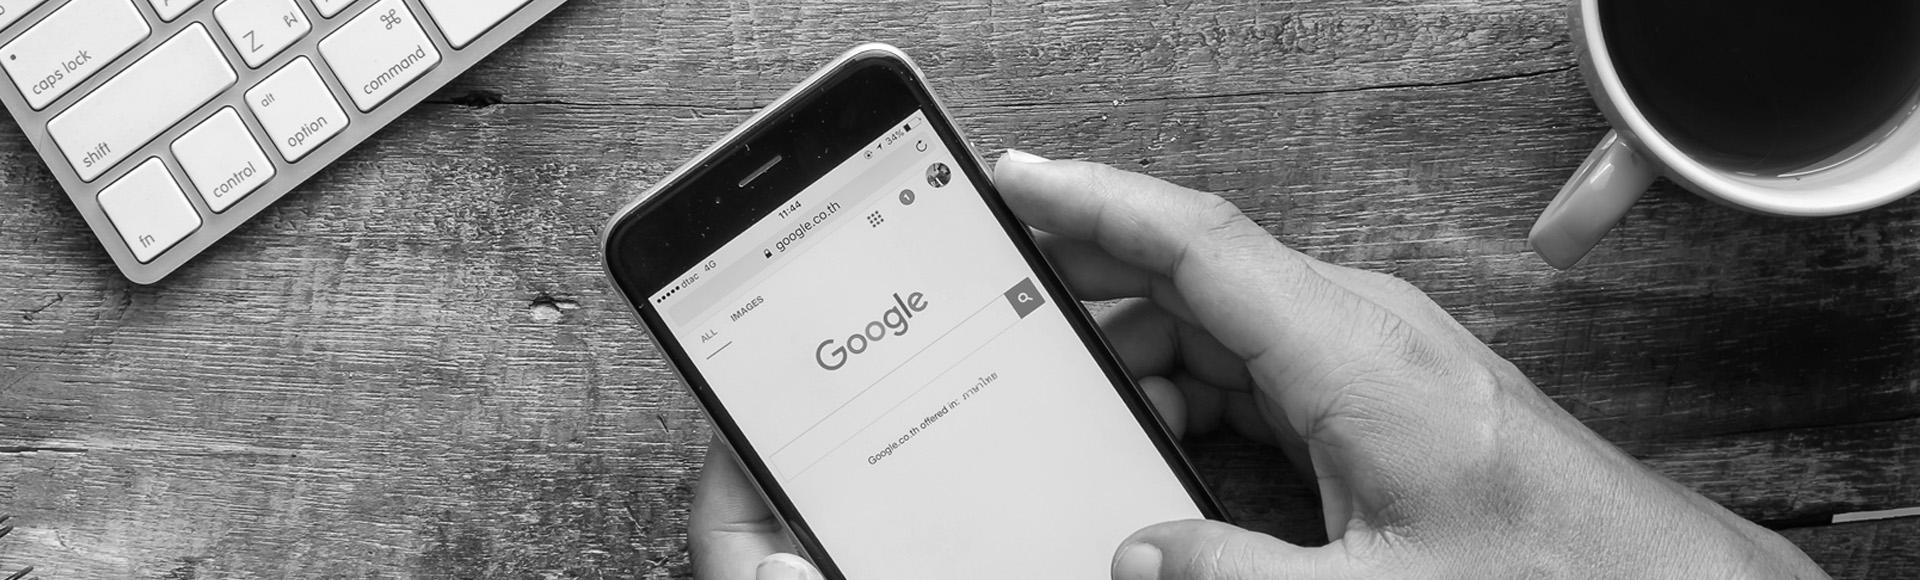 Google Whitelisting and Penalisation Recovery Services with Nexa, Dubai